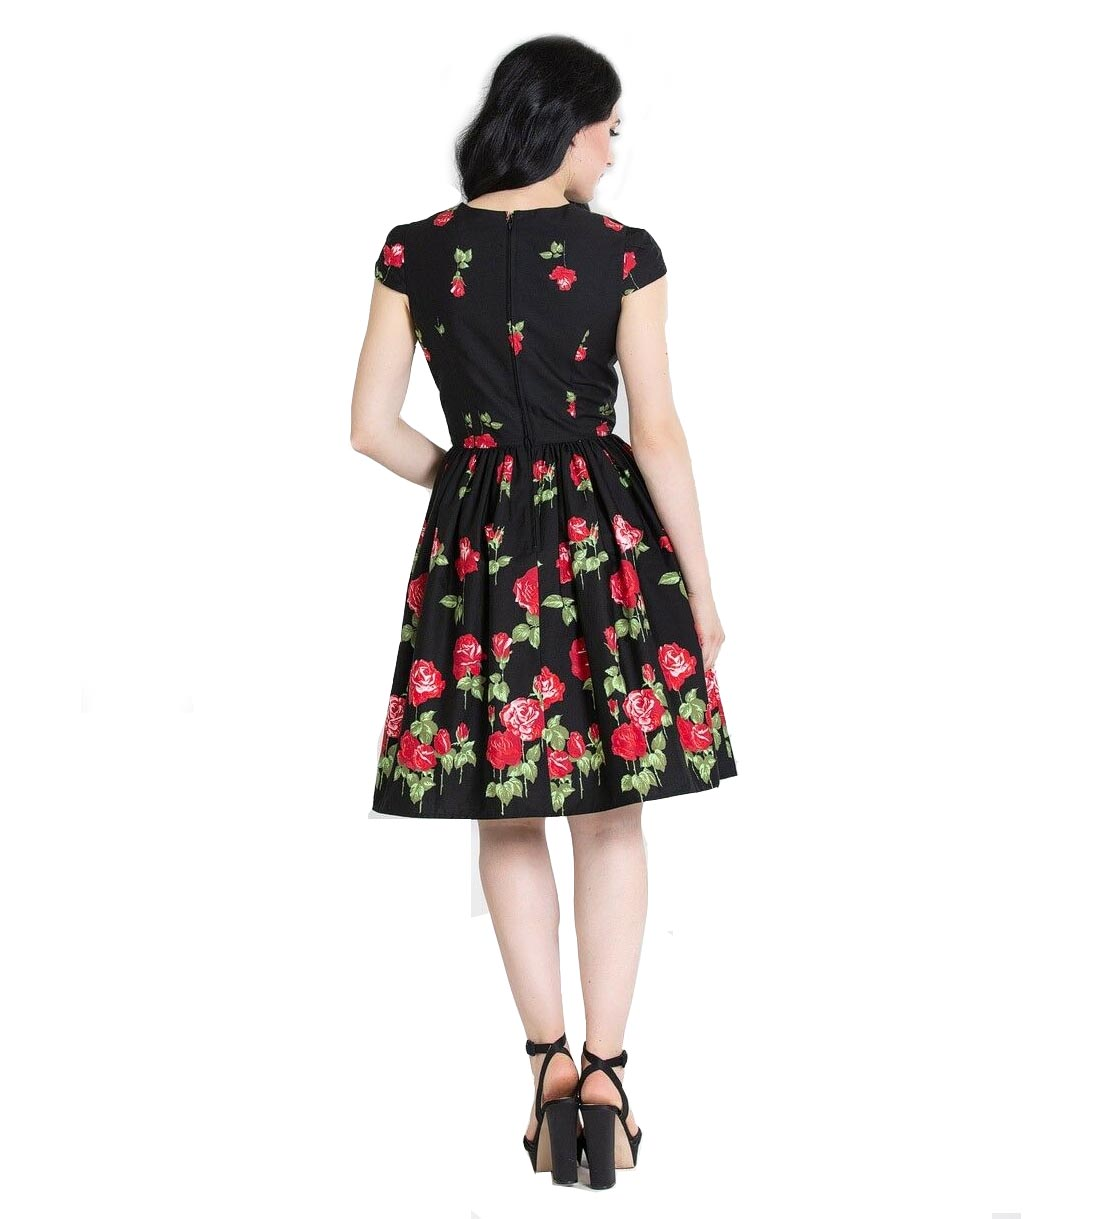 Hell-Bunny-Pin-Up-Mid-Length-50s-Dress-ANTONIA-Rose-Floral-Black thumbnail 17